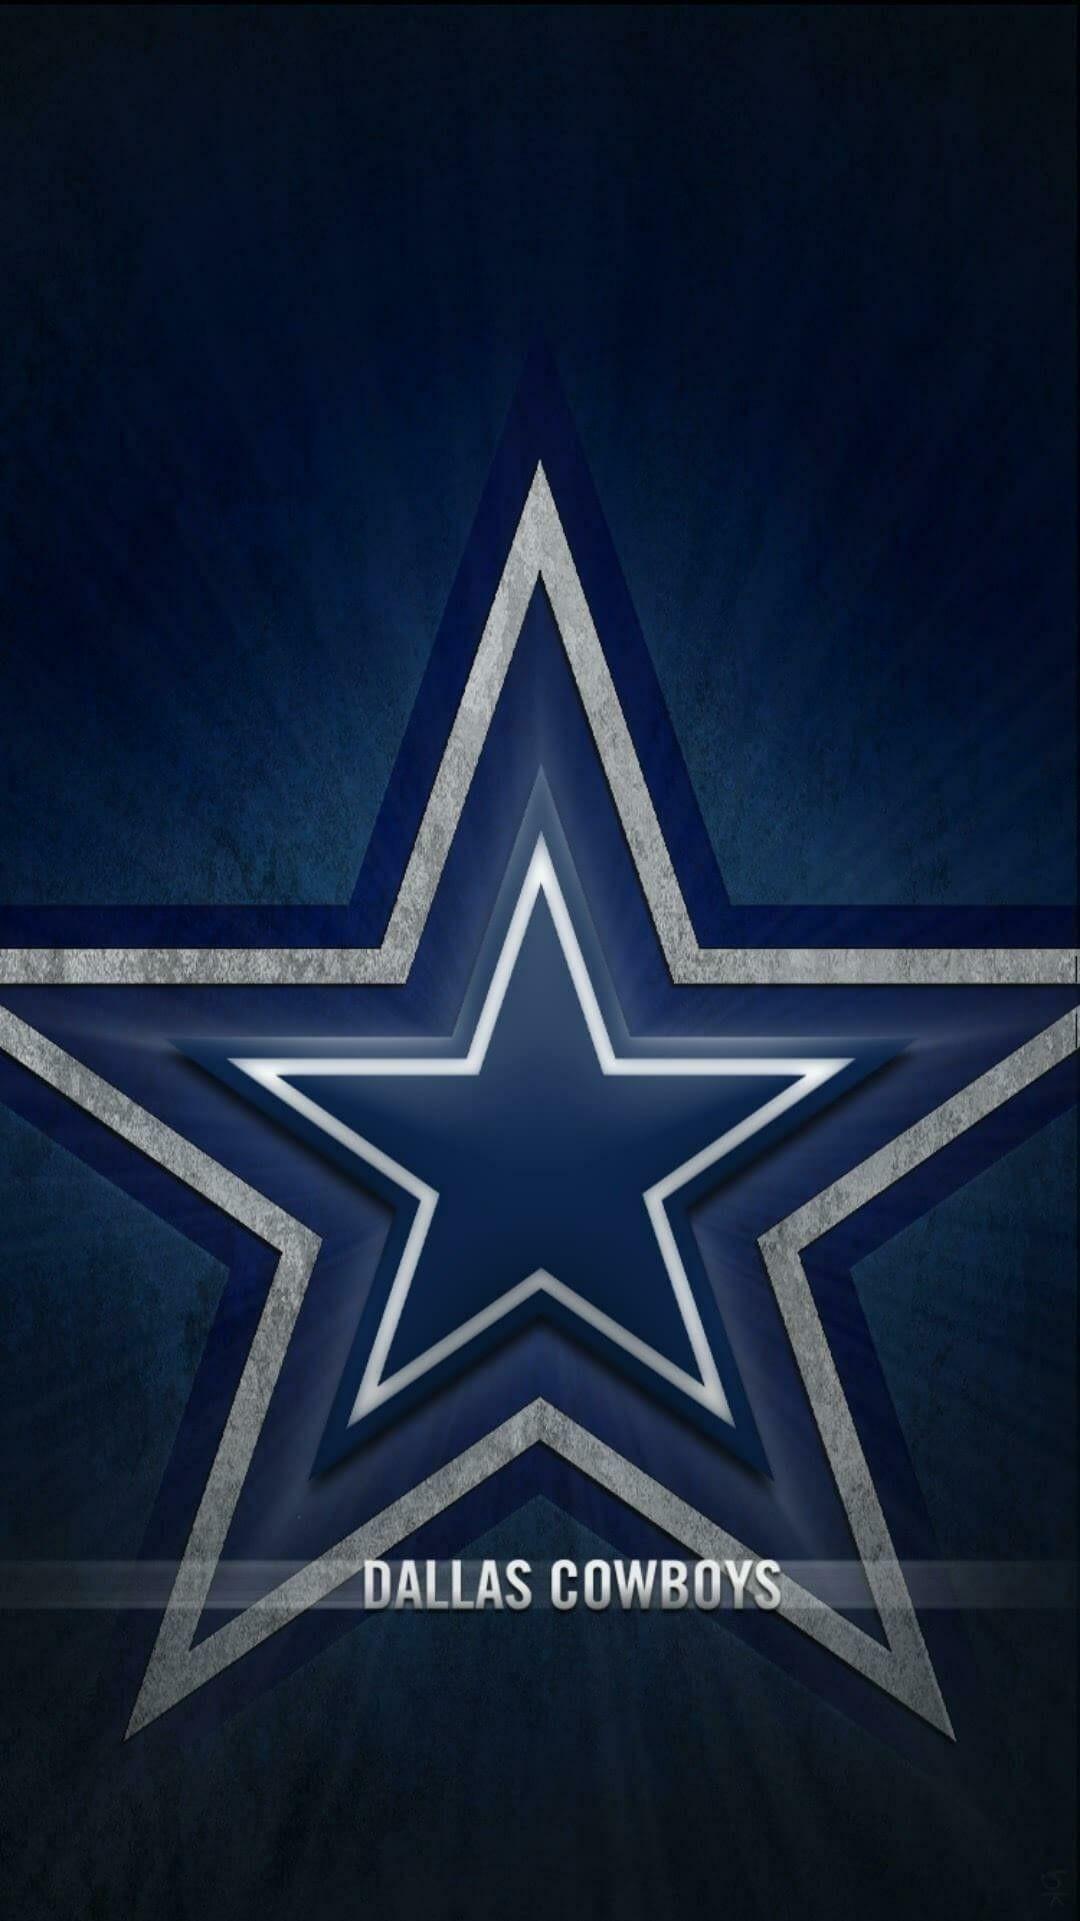 Dallas Cowboys Logos And Wallpapers 65 Images